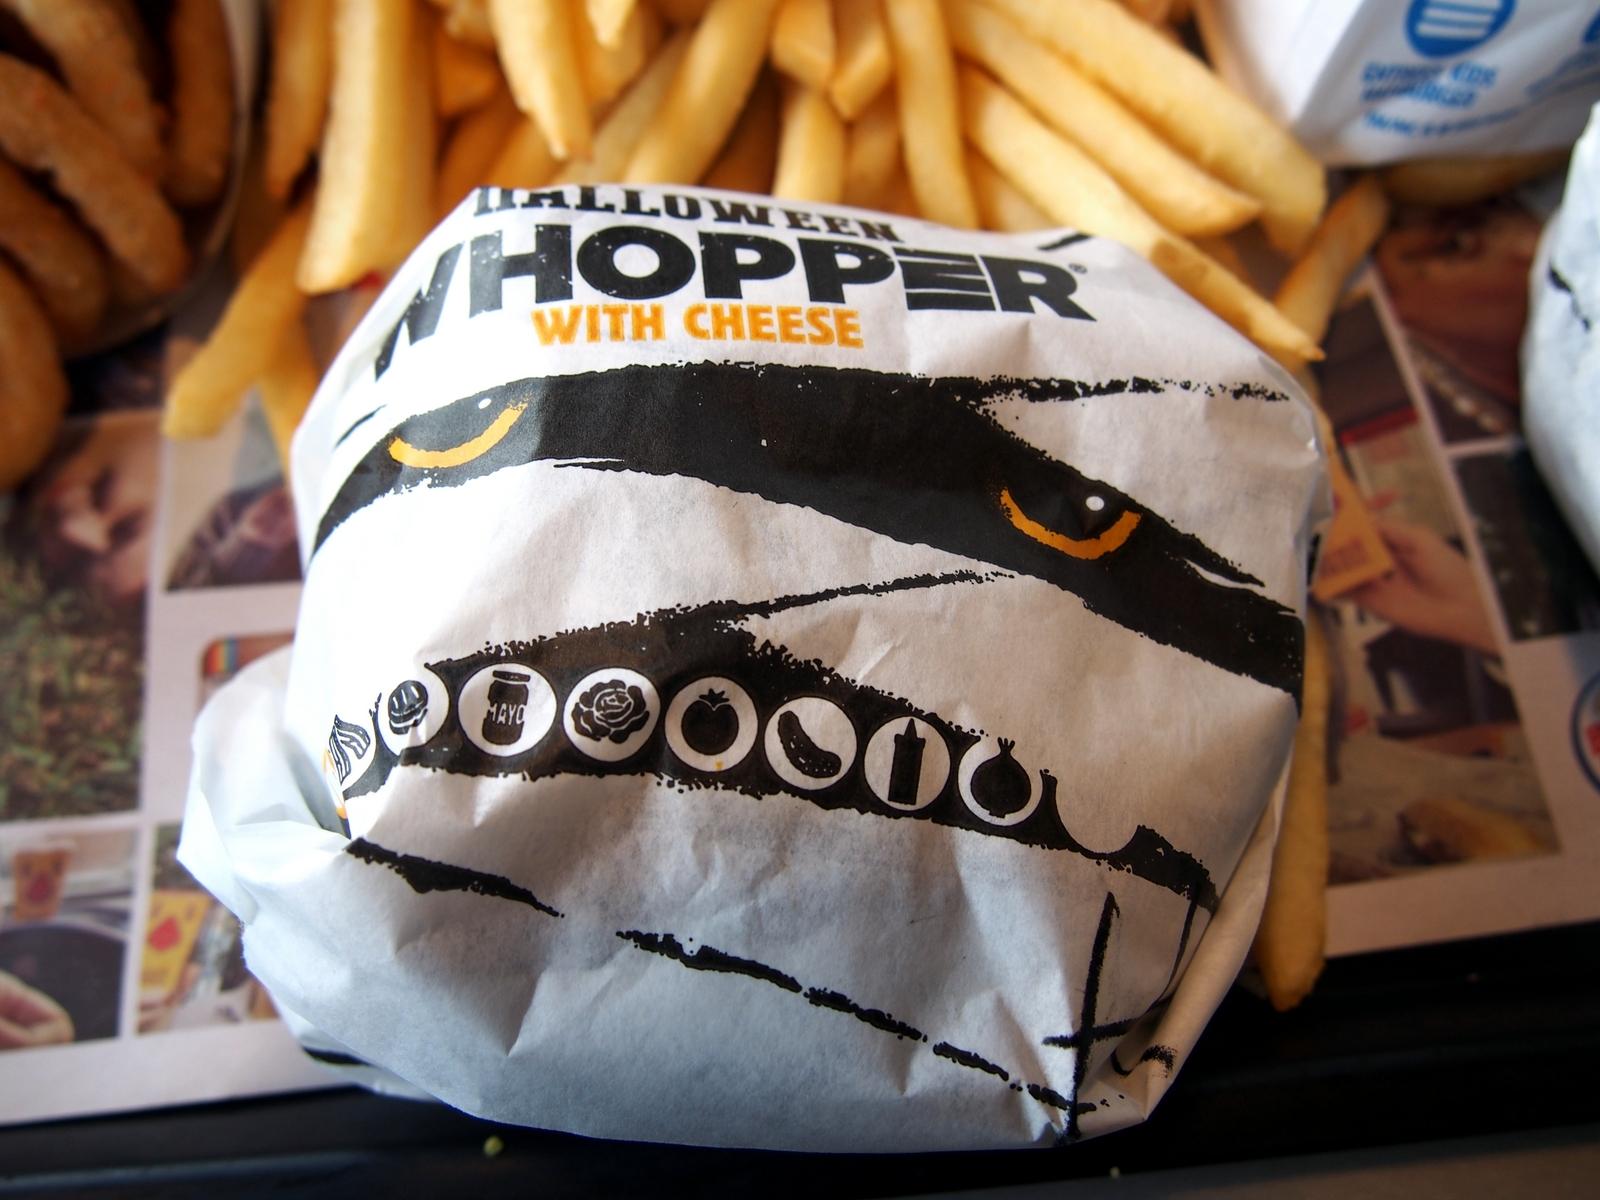 OTIS (Odd Things I've Seen): Buns of Sable: The Burger King ...